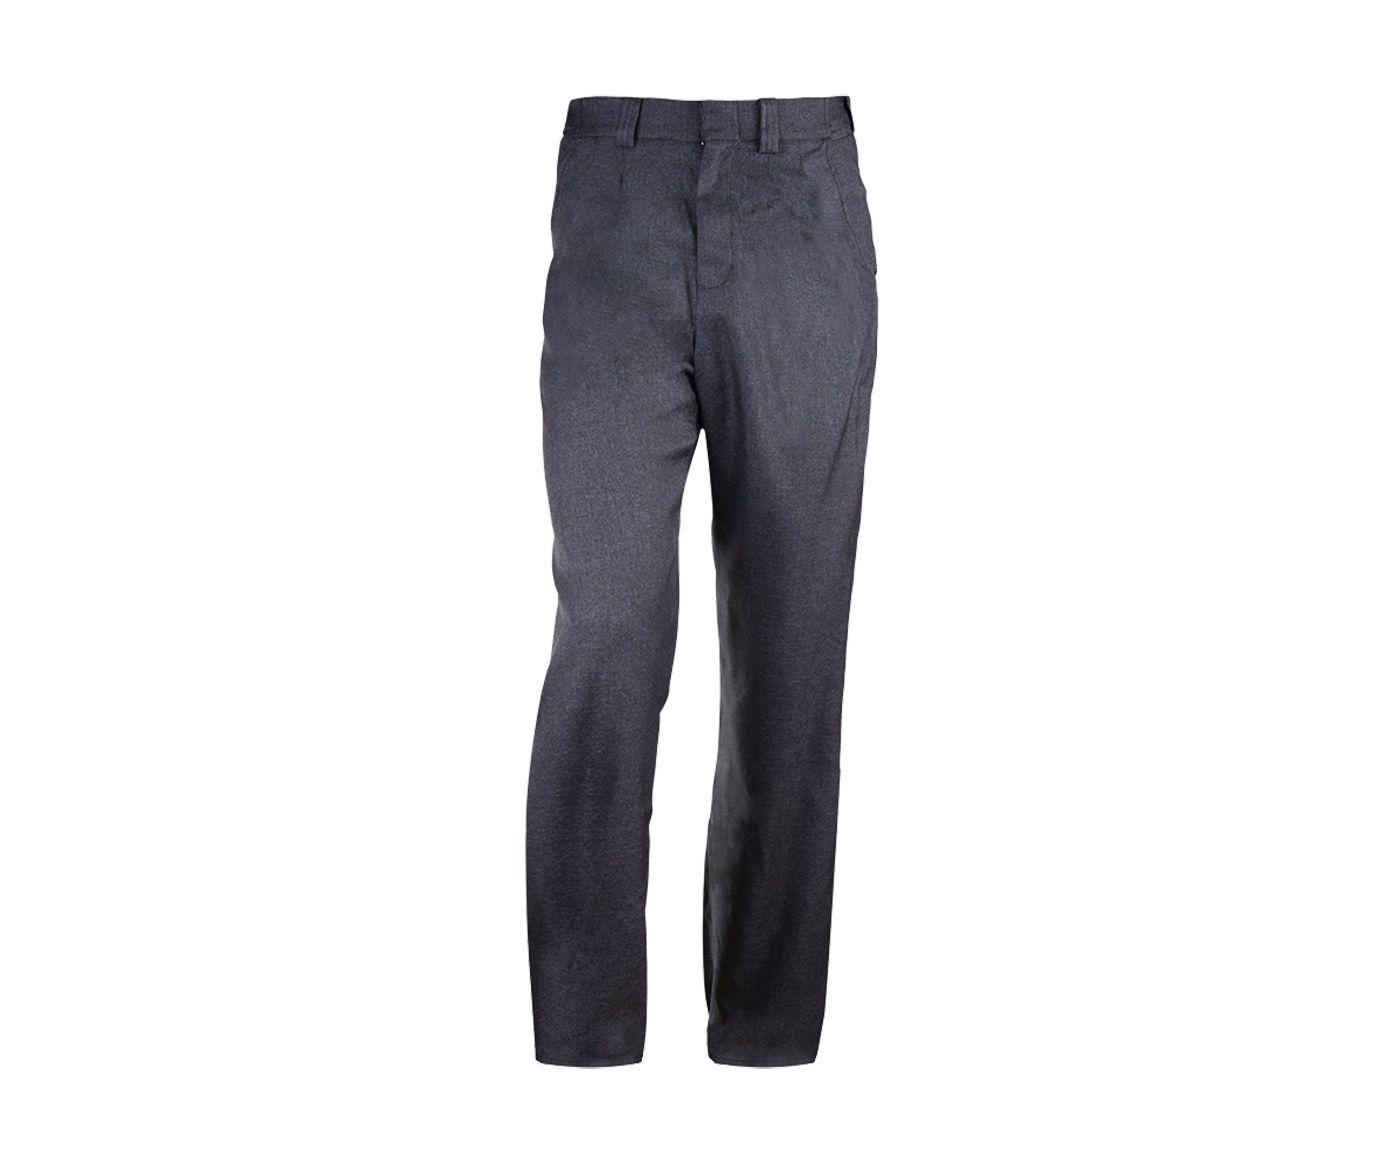 3N2 Adult Combo Pants w/ Expander Waist